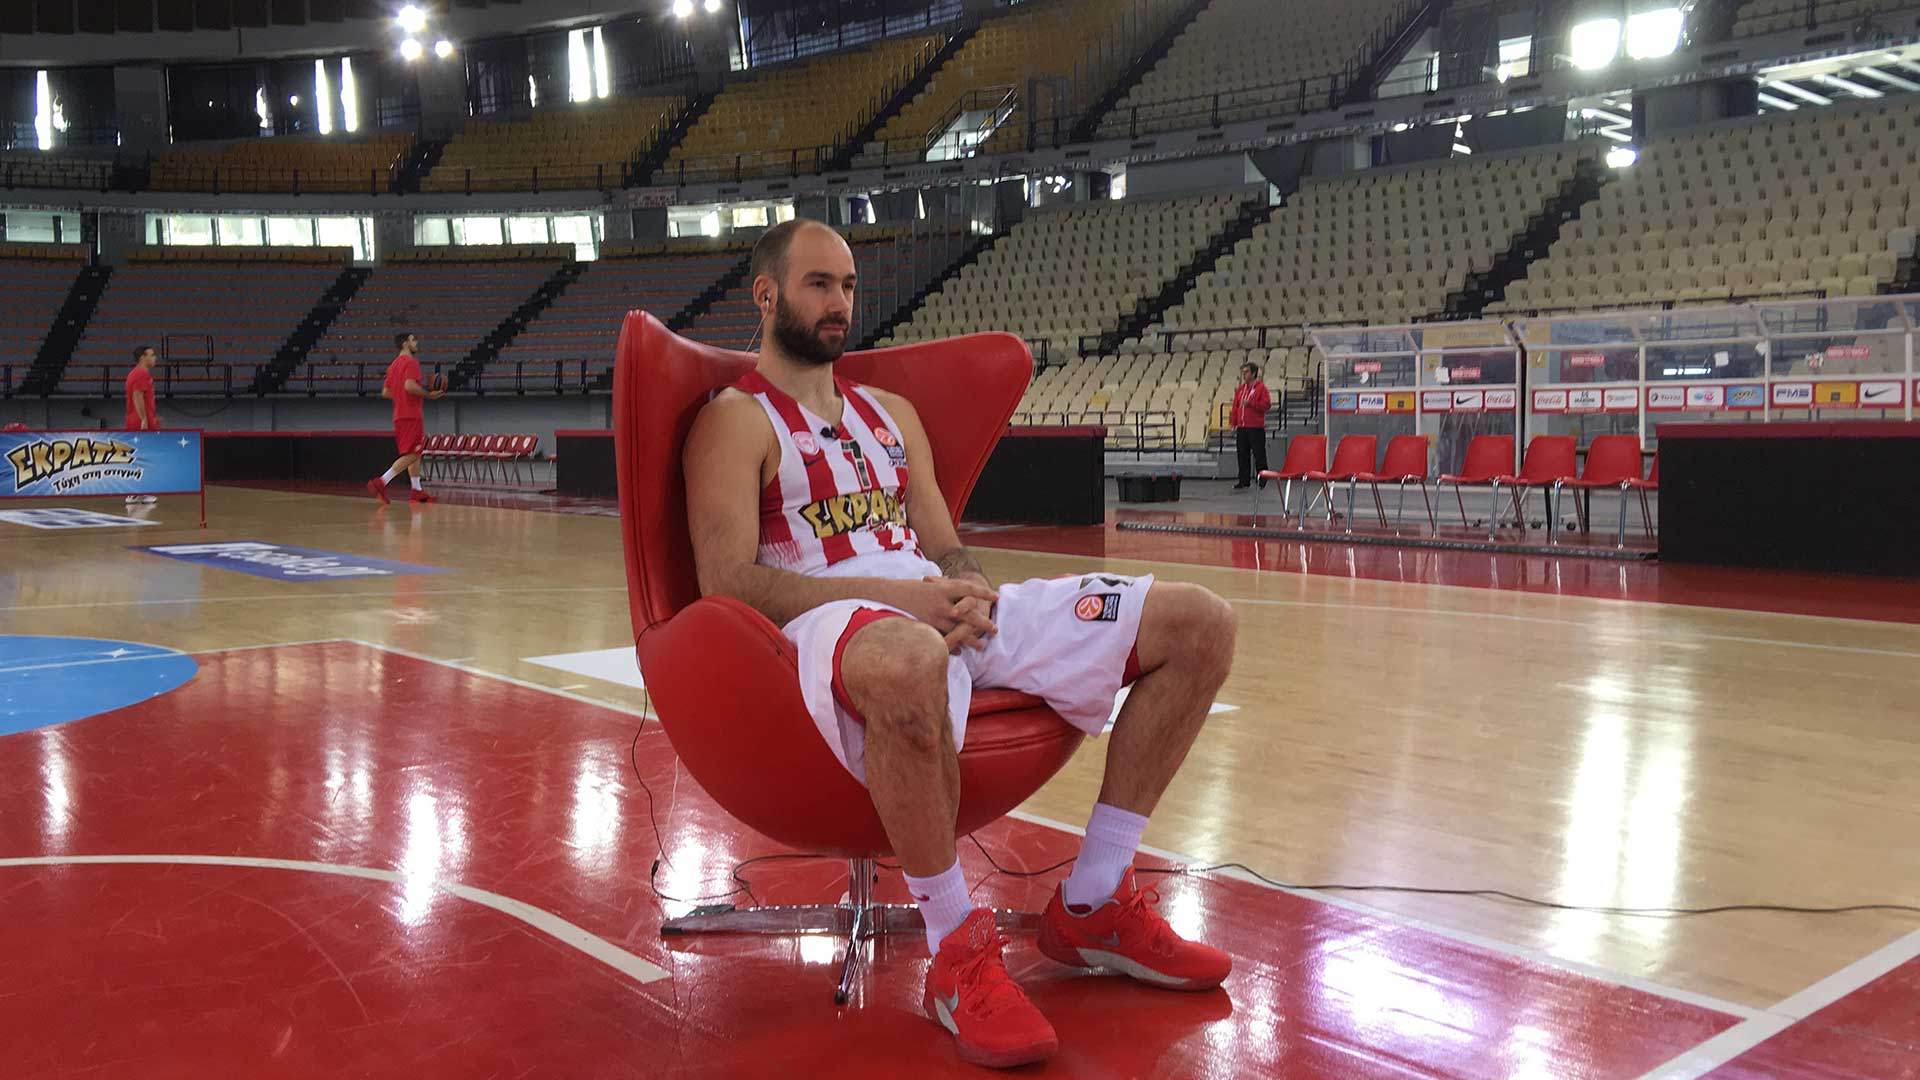 Exclusión Risa Manchuria  7 clicks from the SKRATS Hangout of Vassilis Spanoulis - Olympiacos BC